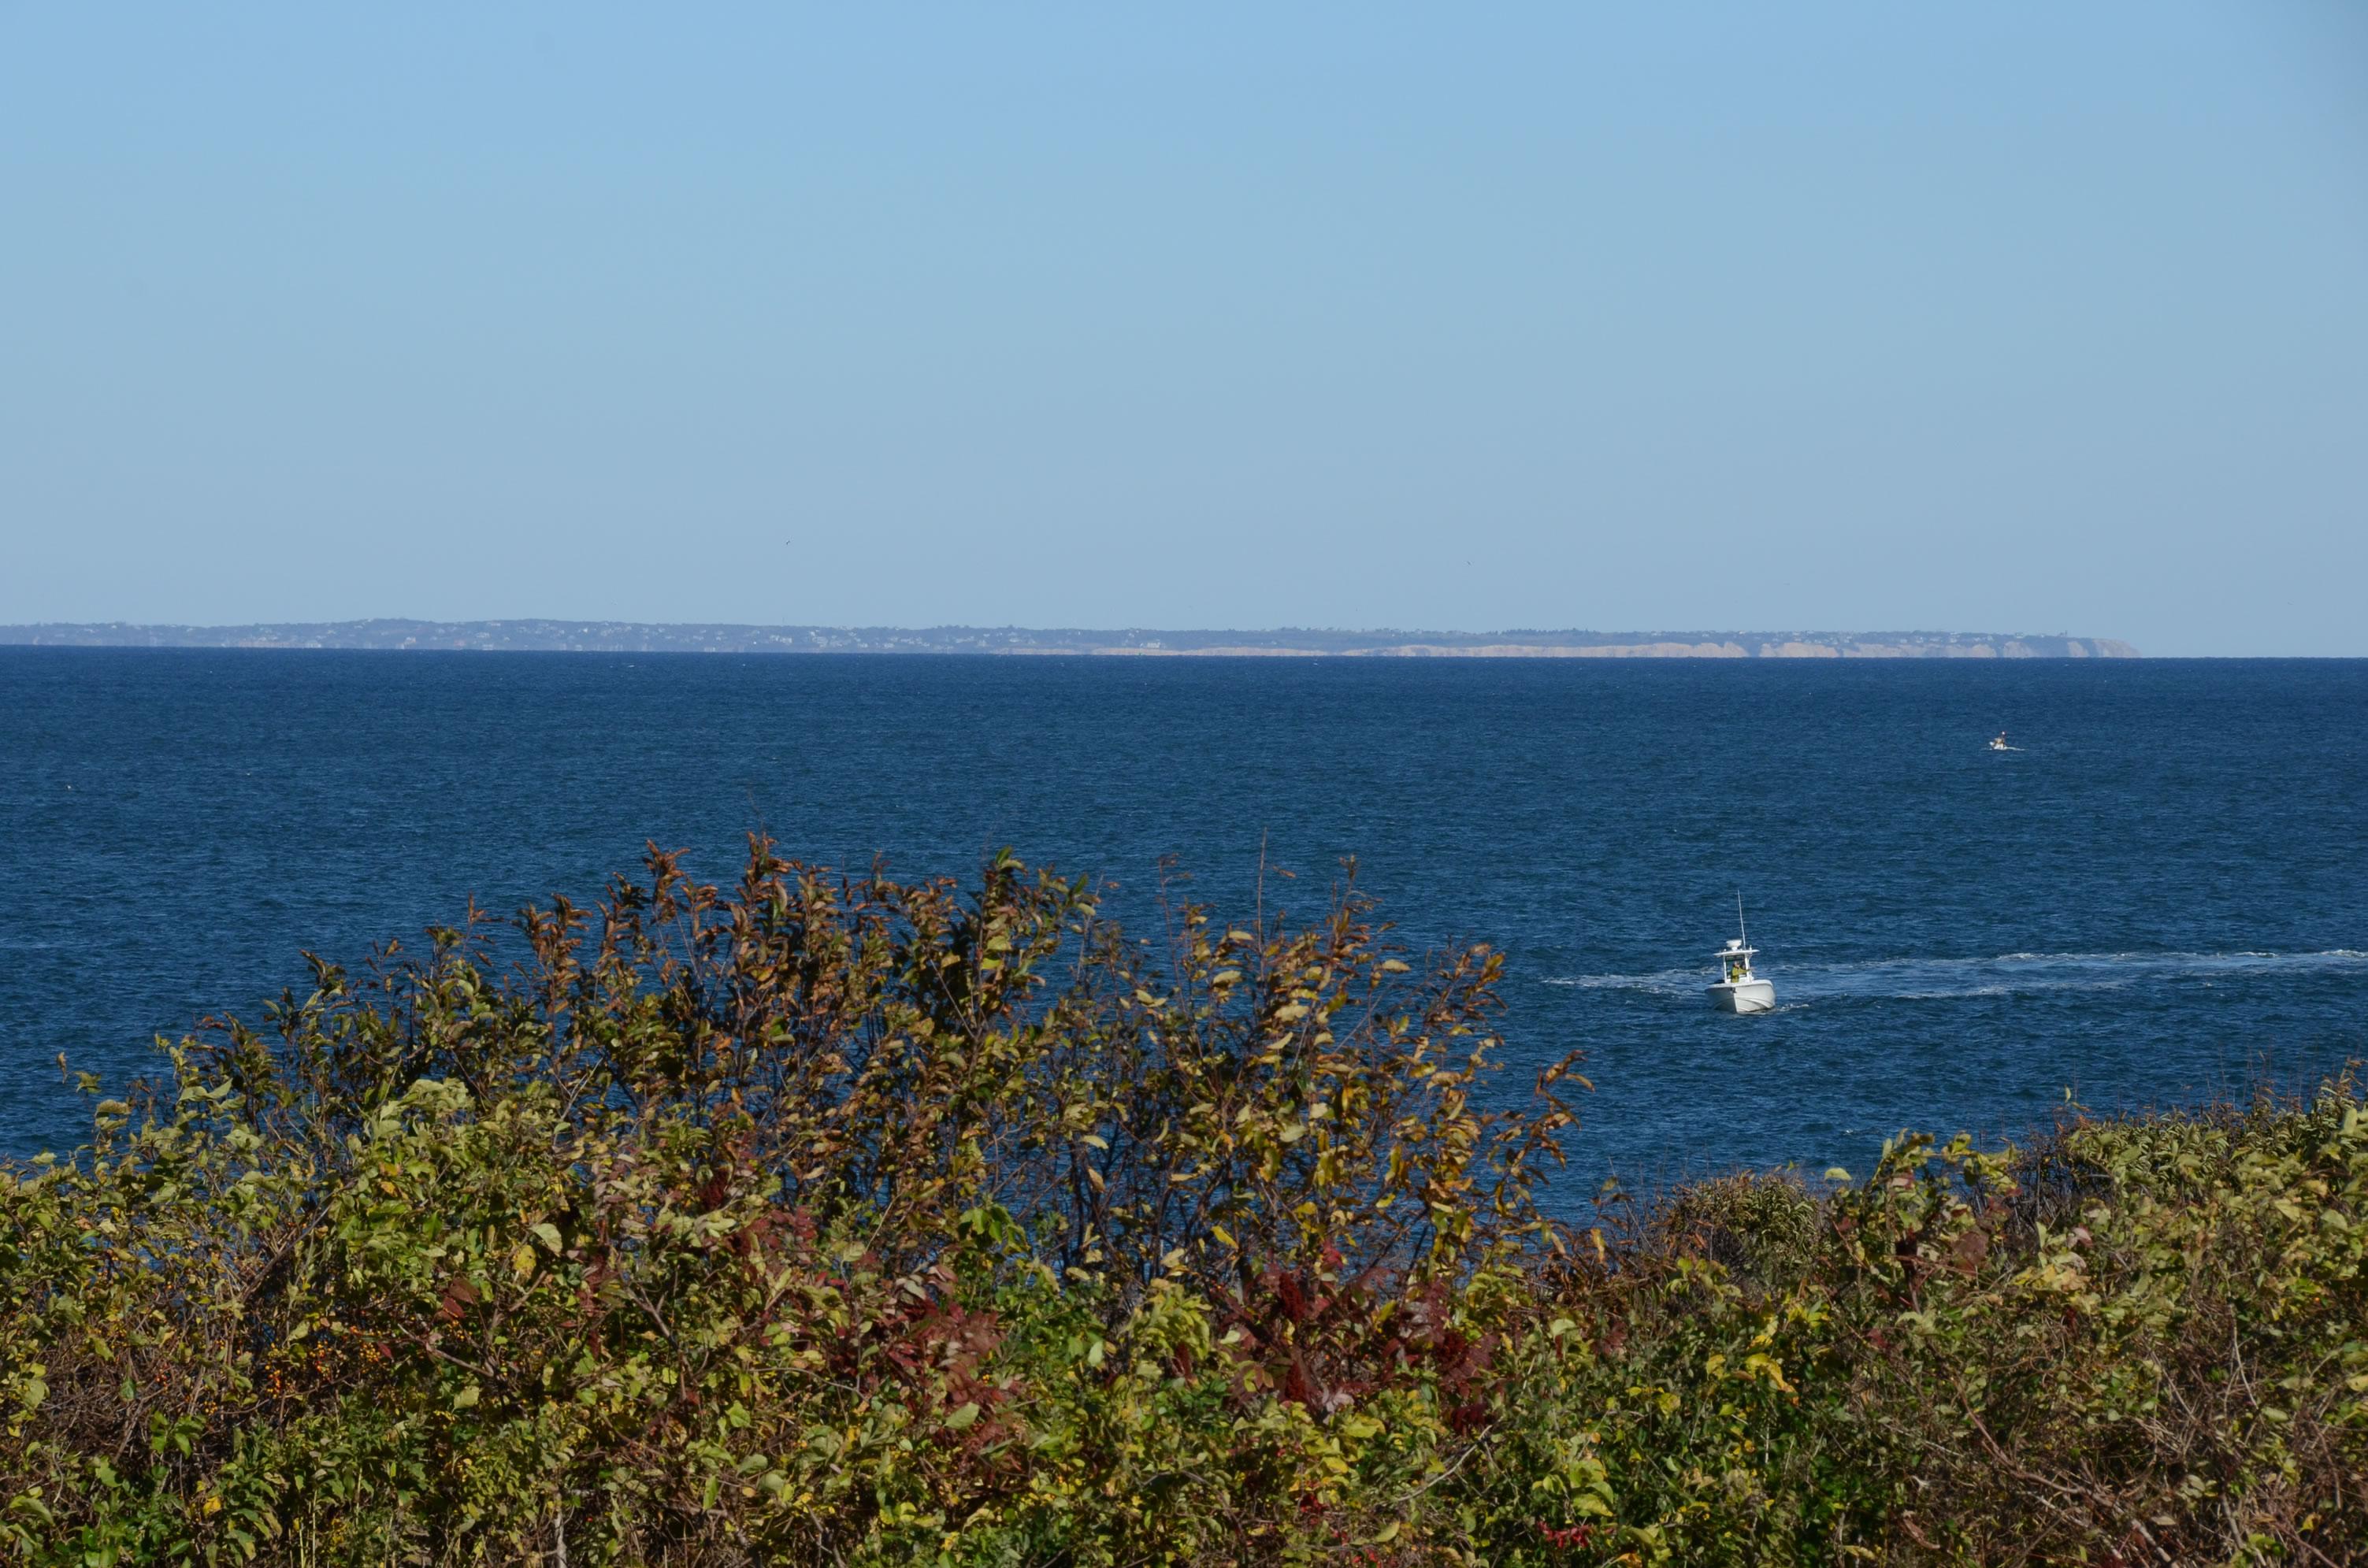 Fishing boat off Montauk